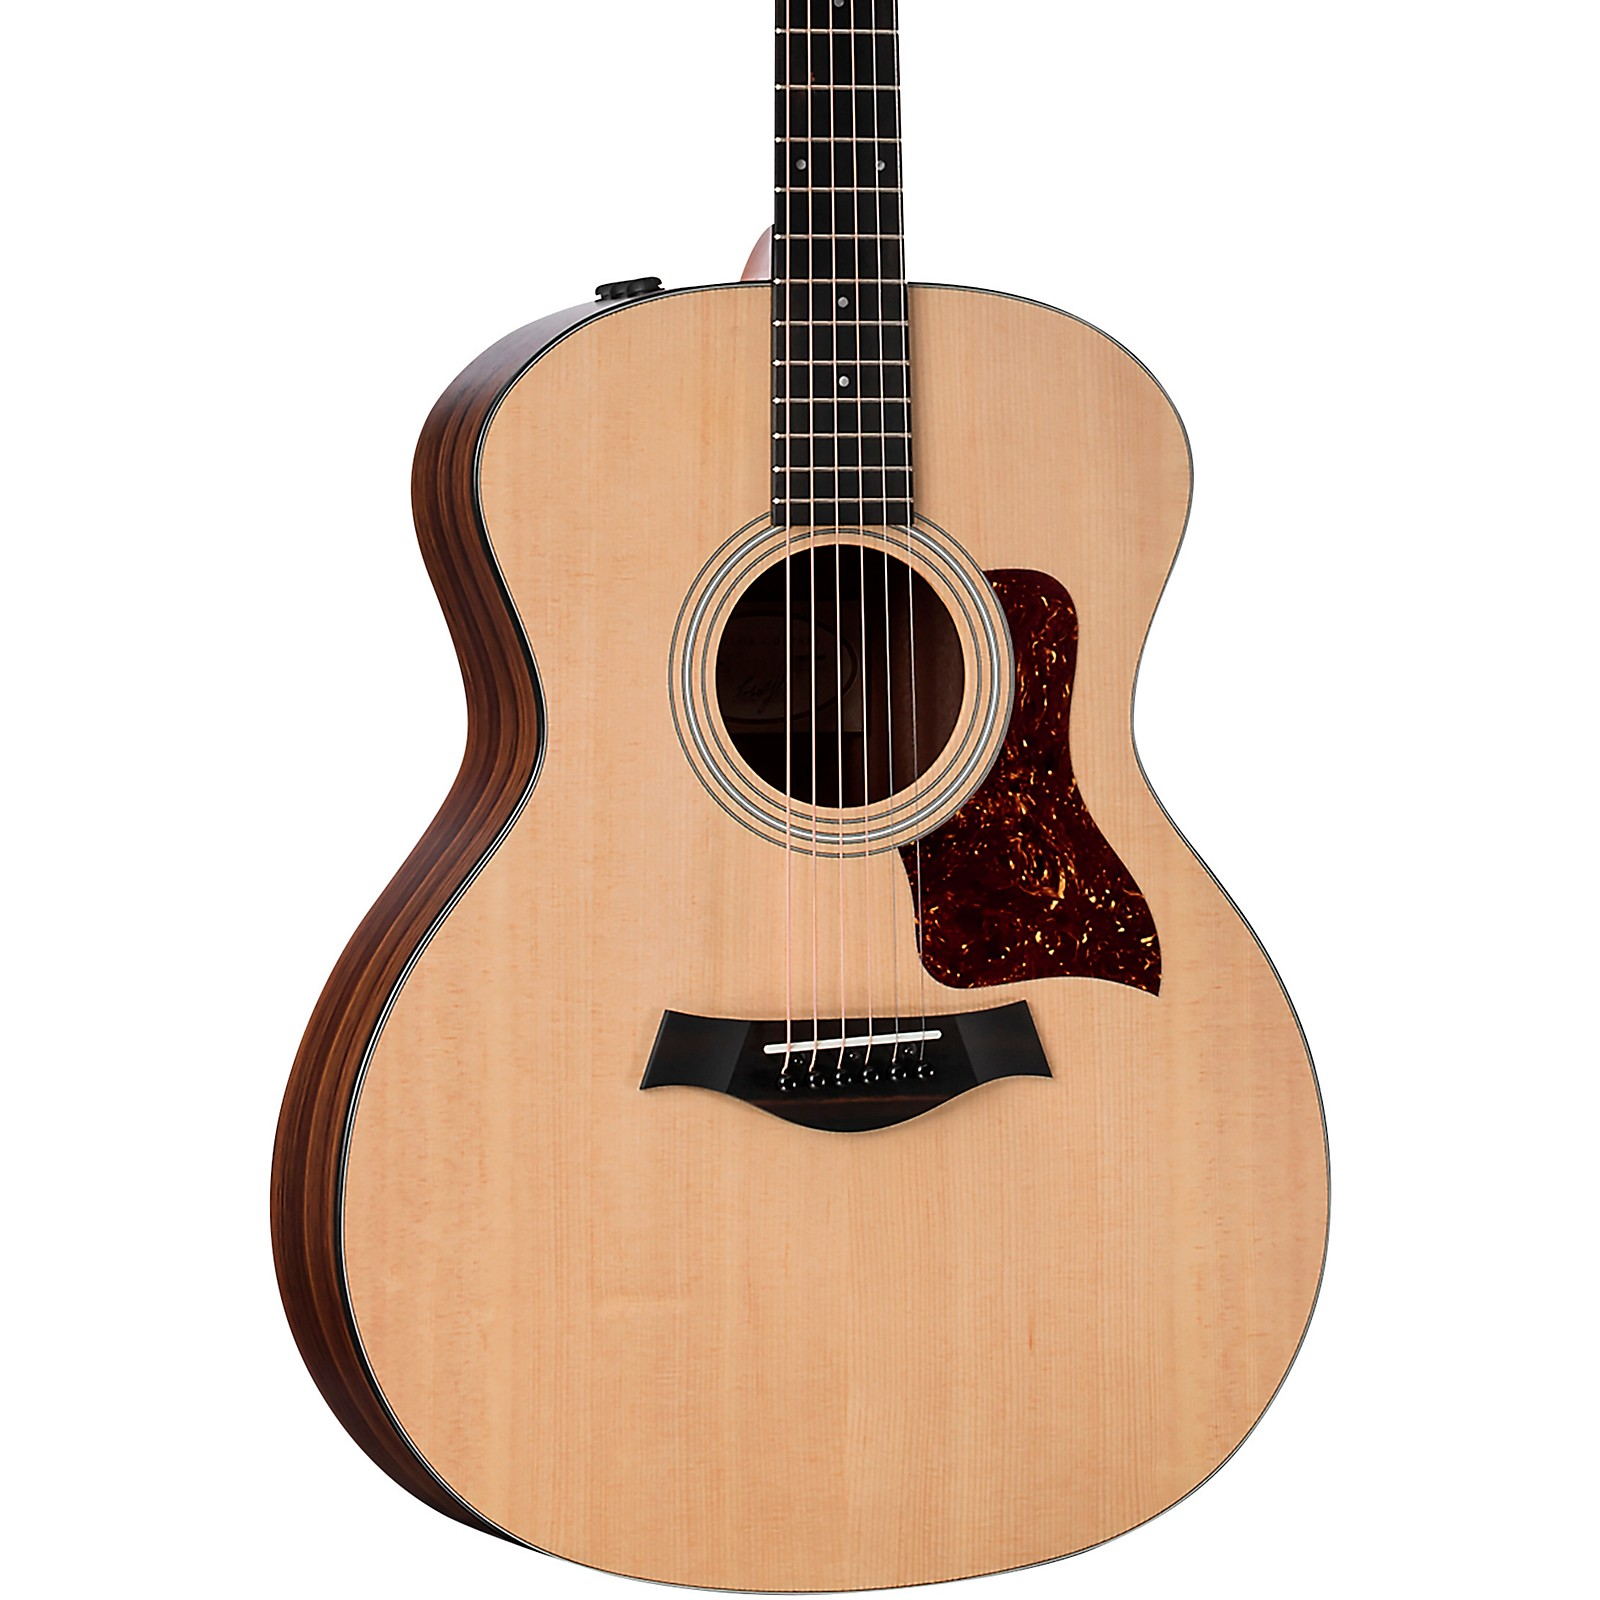 Taylor 114e Rosewood Grand Auditorium Acoustic-Electric Guitar